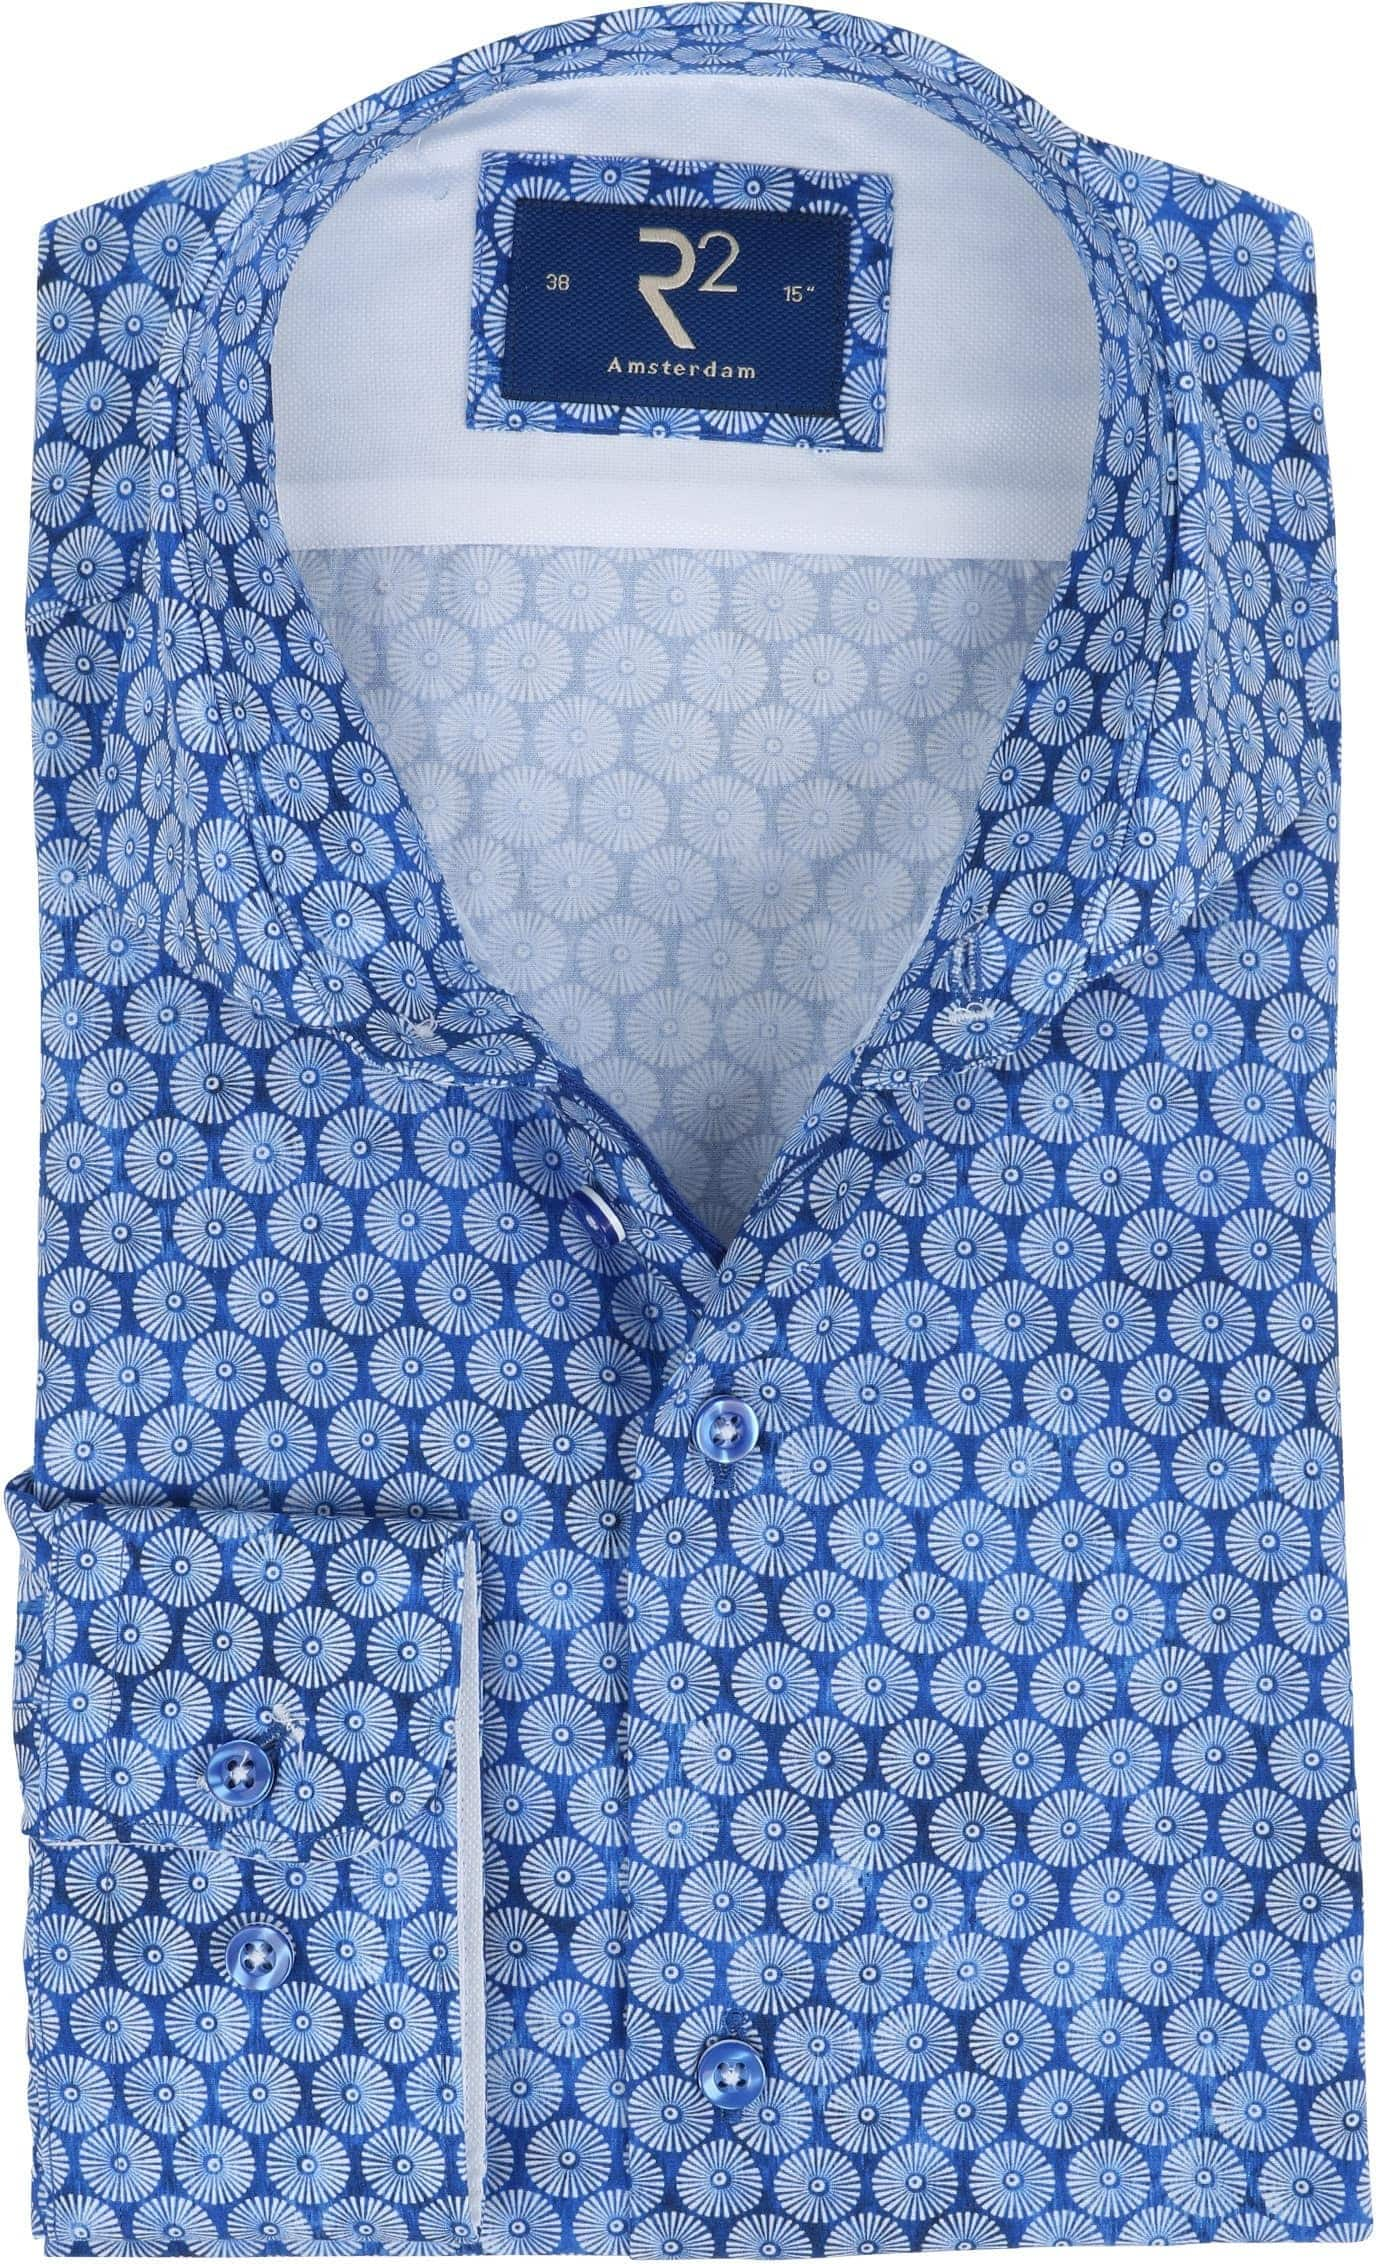 R2 Overhemd Blauw Parasols foto 0